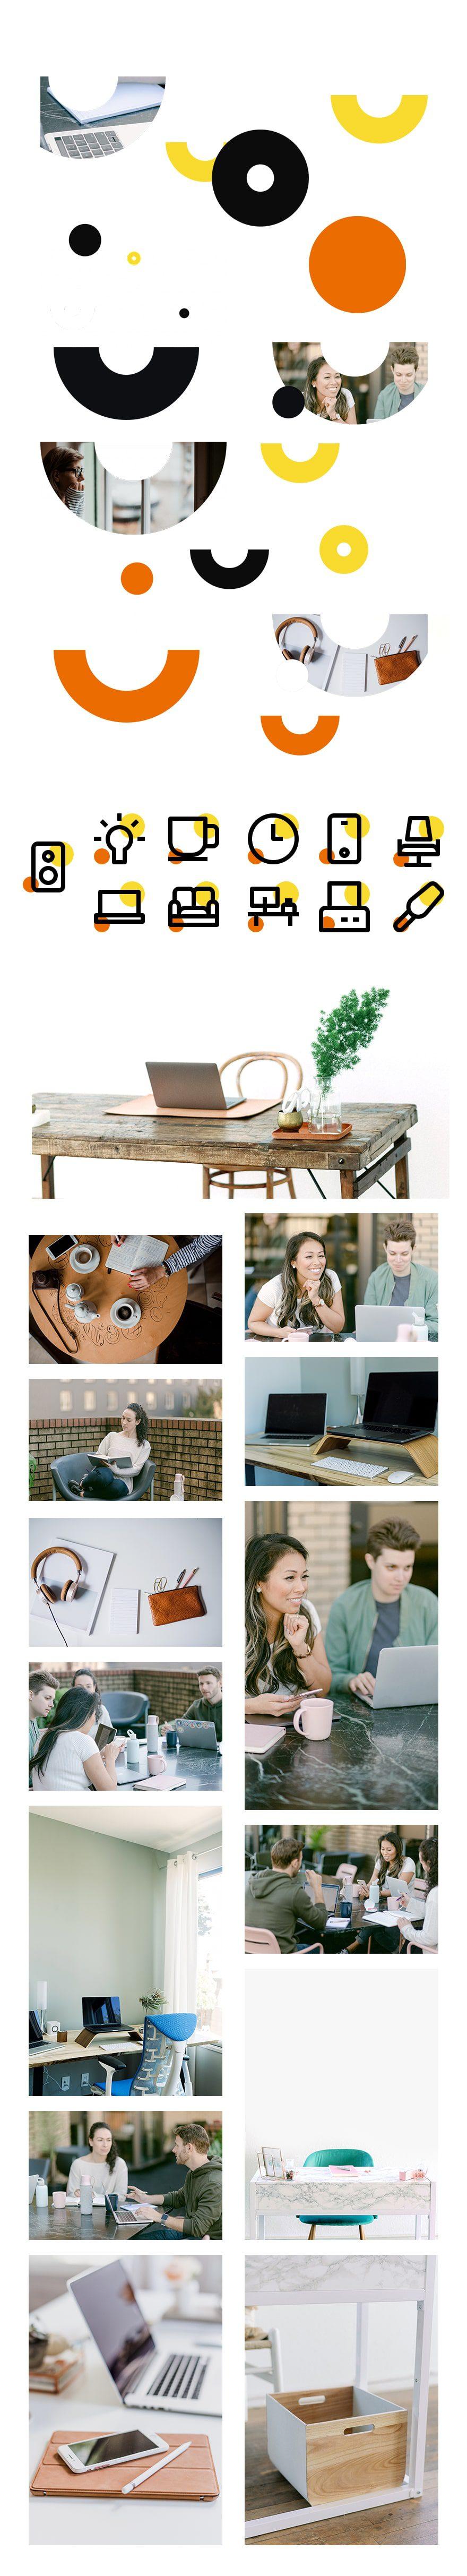 coworking space website